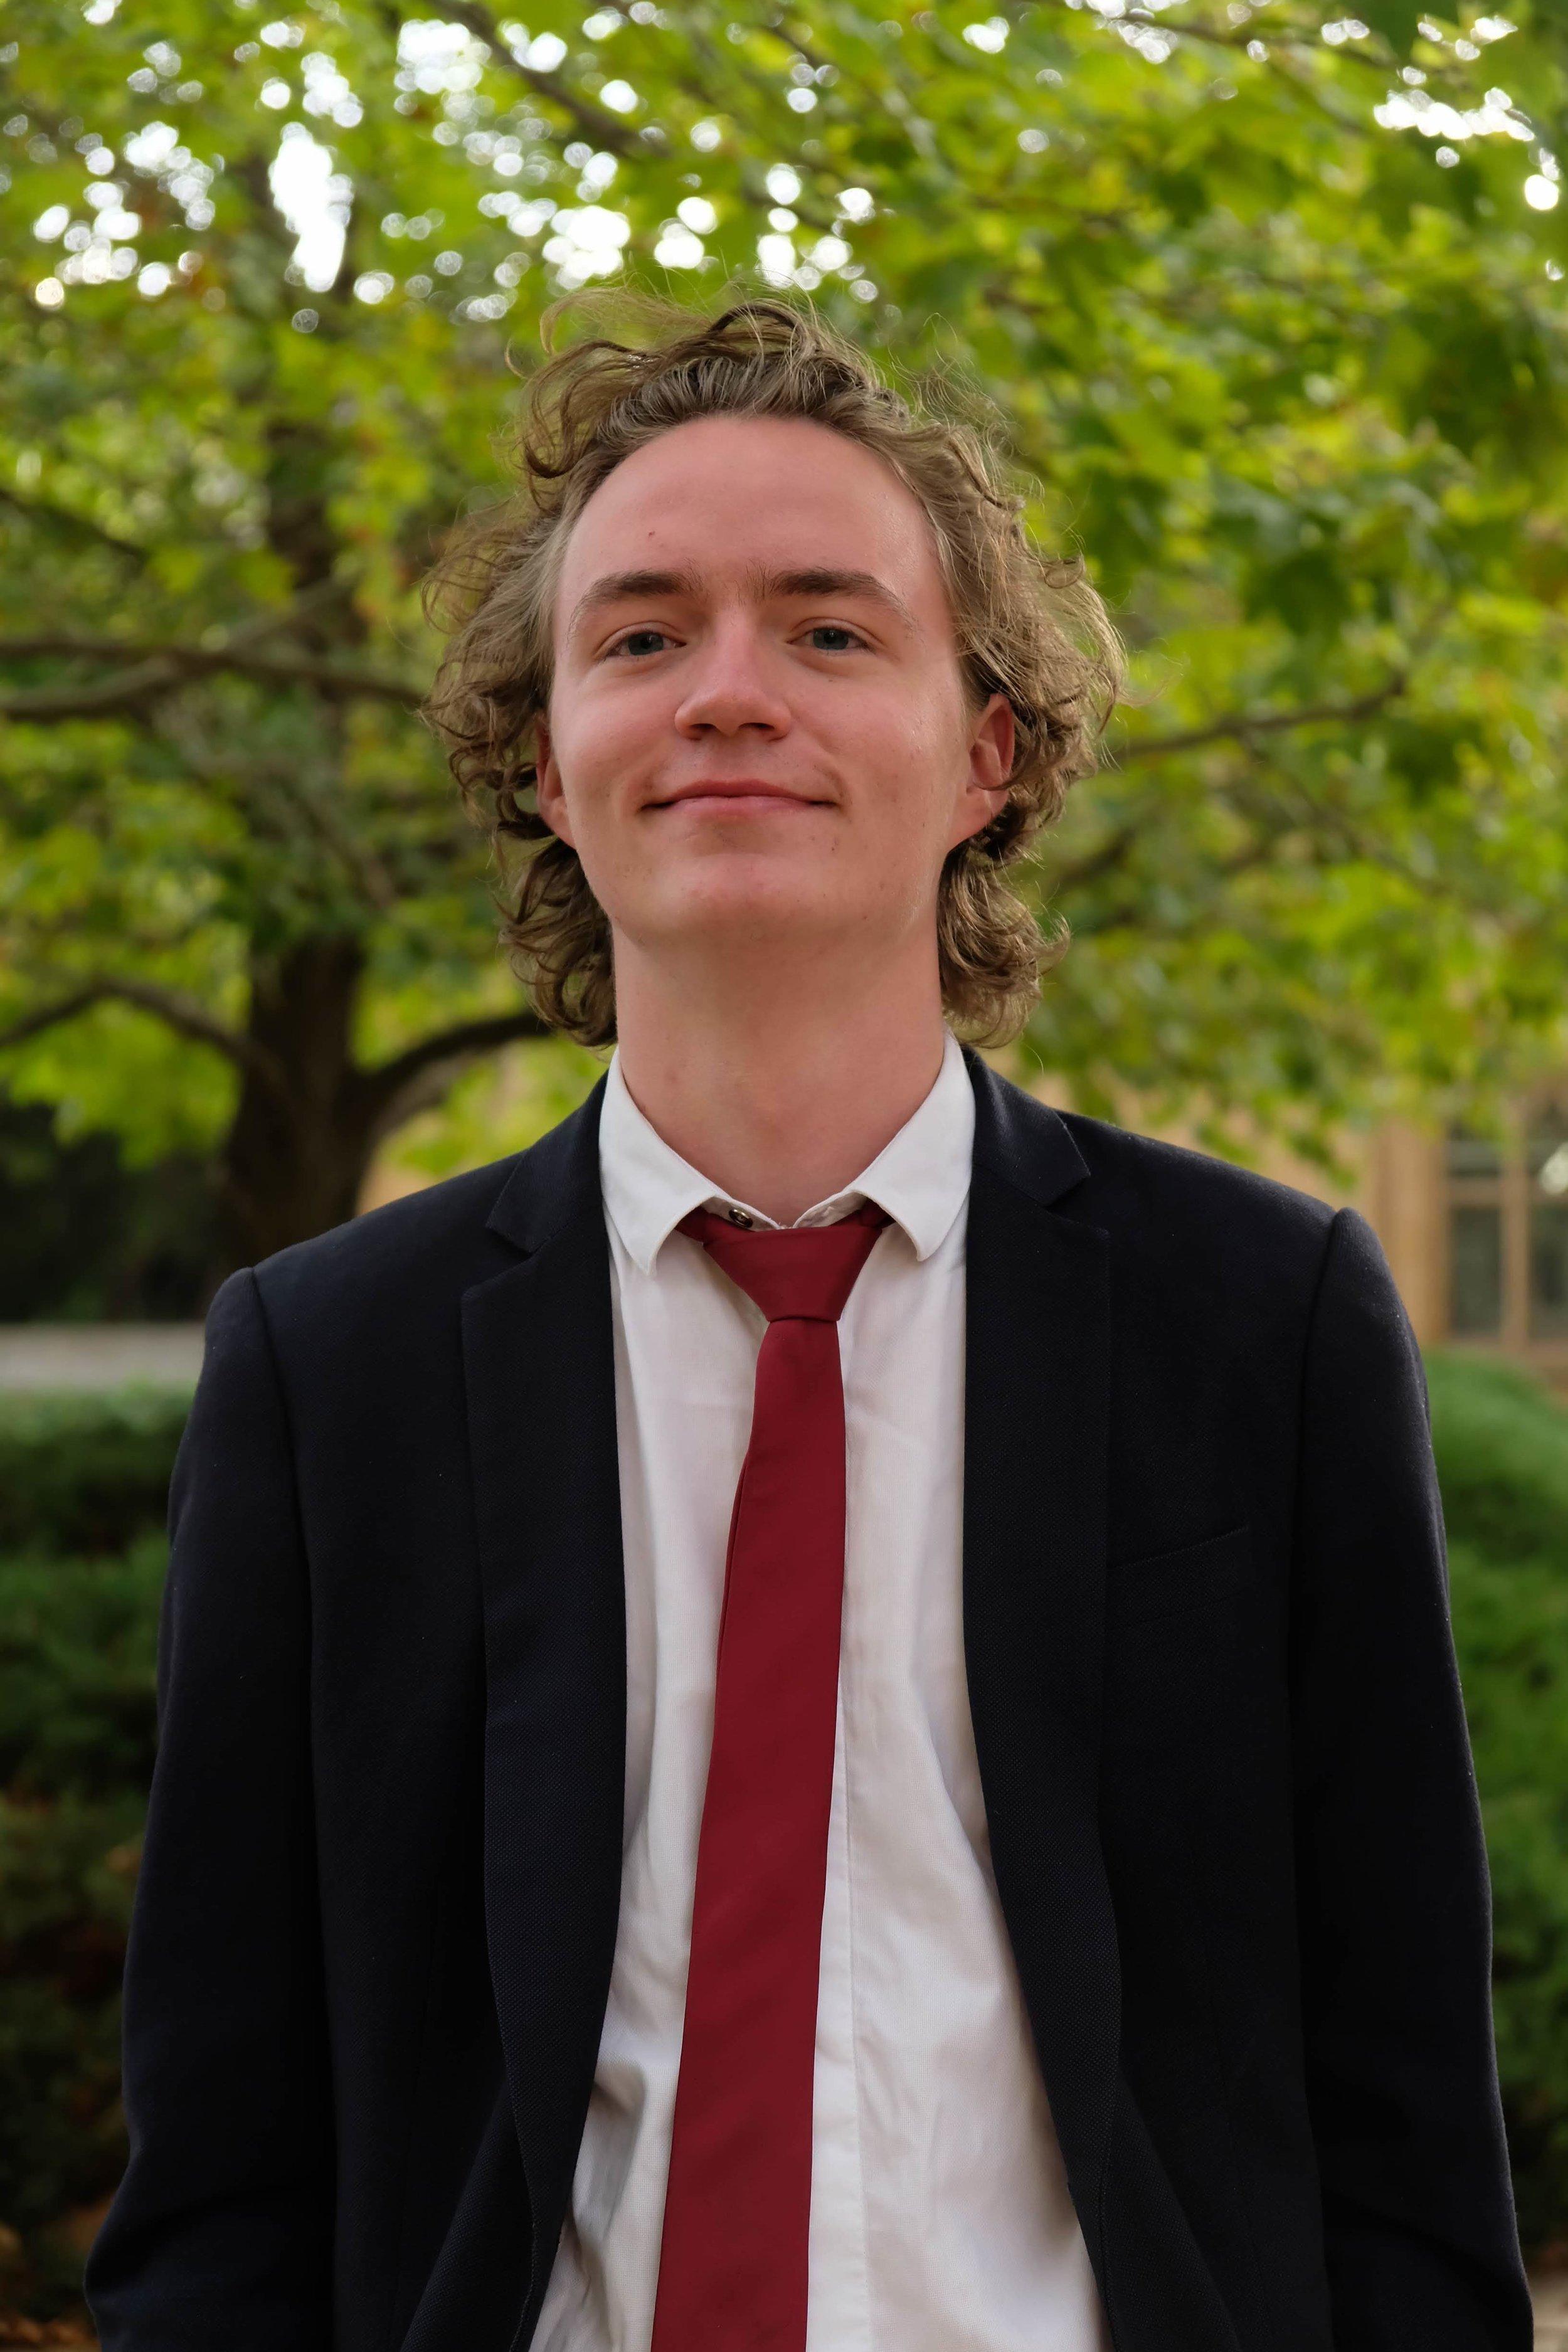 Ned Scott - Co-Vice President of Initiatives